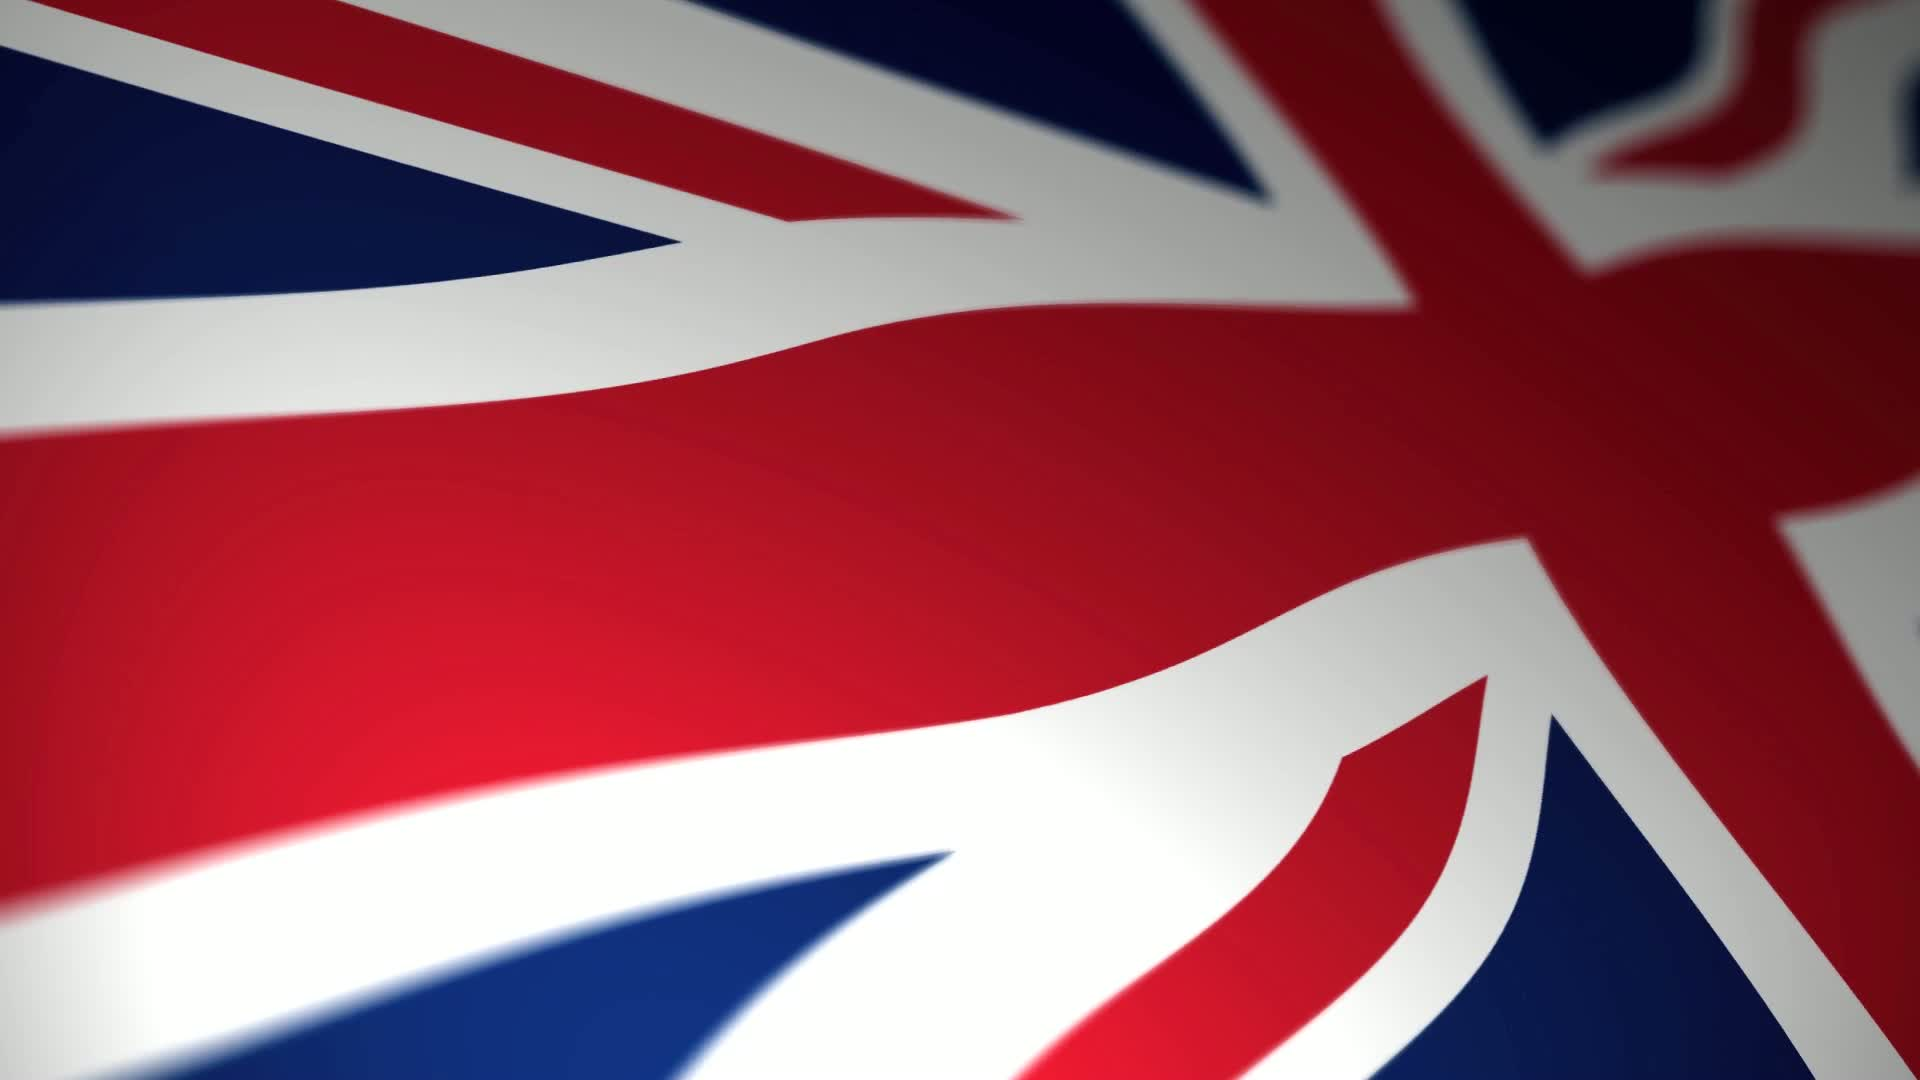 British Flag Wallpapers 1920x1080